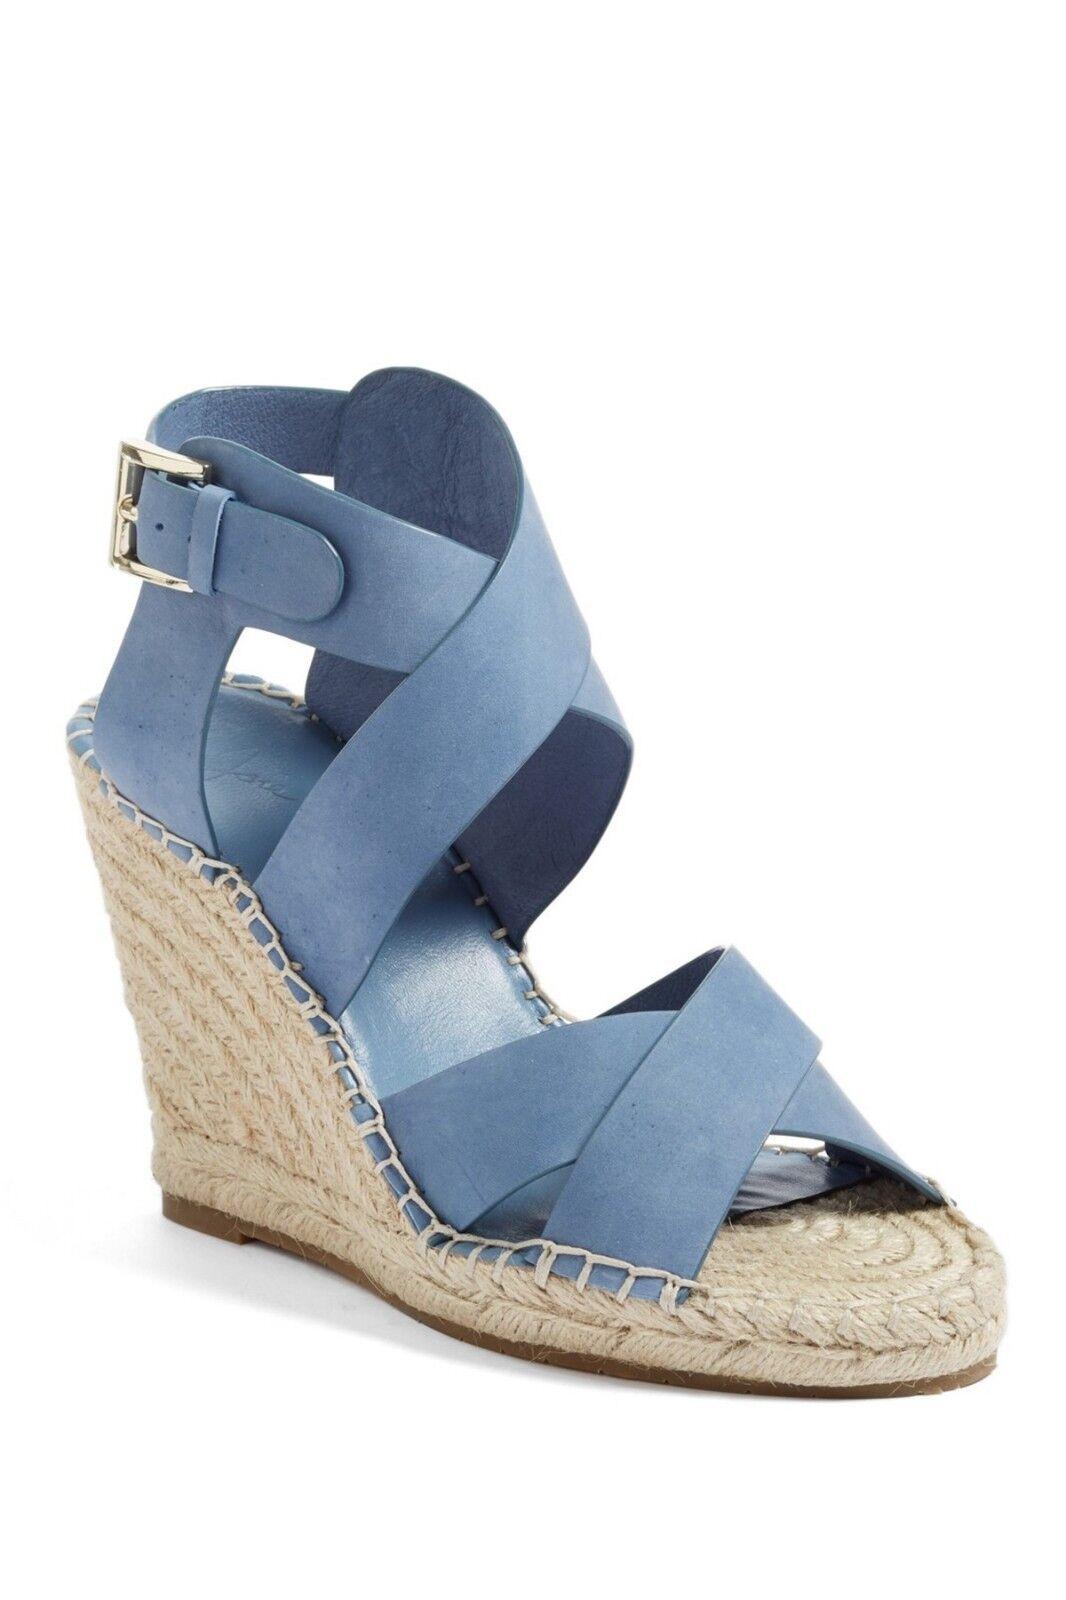 Joie KAELYN Wedge Espadrille Strappy Leather Sandal NIB CLOUD bluee 40 10  278